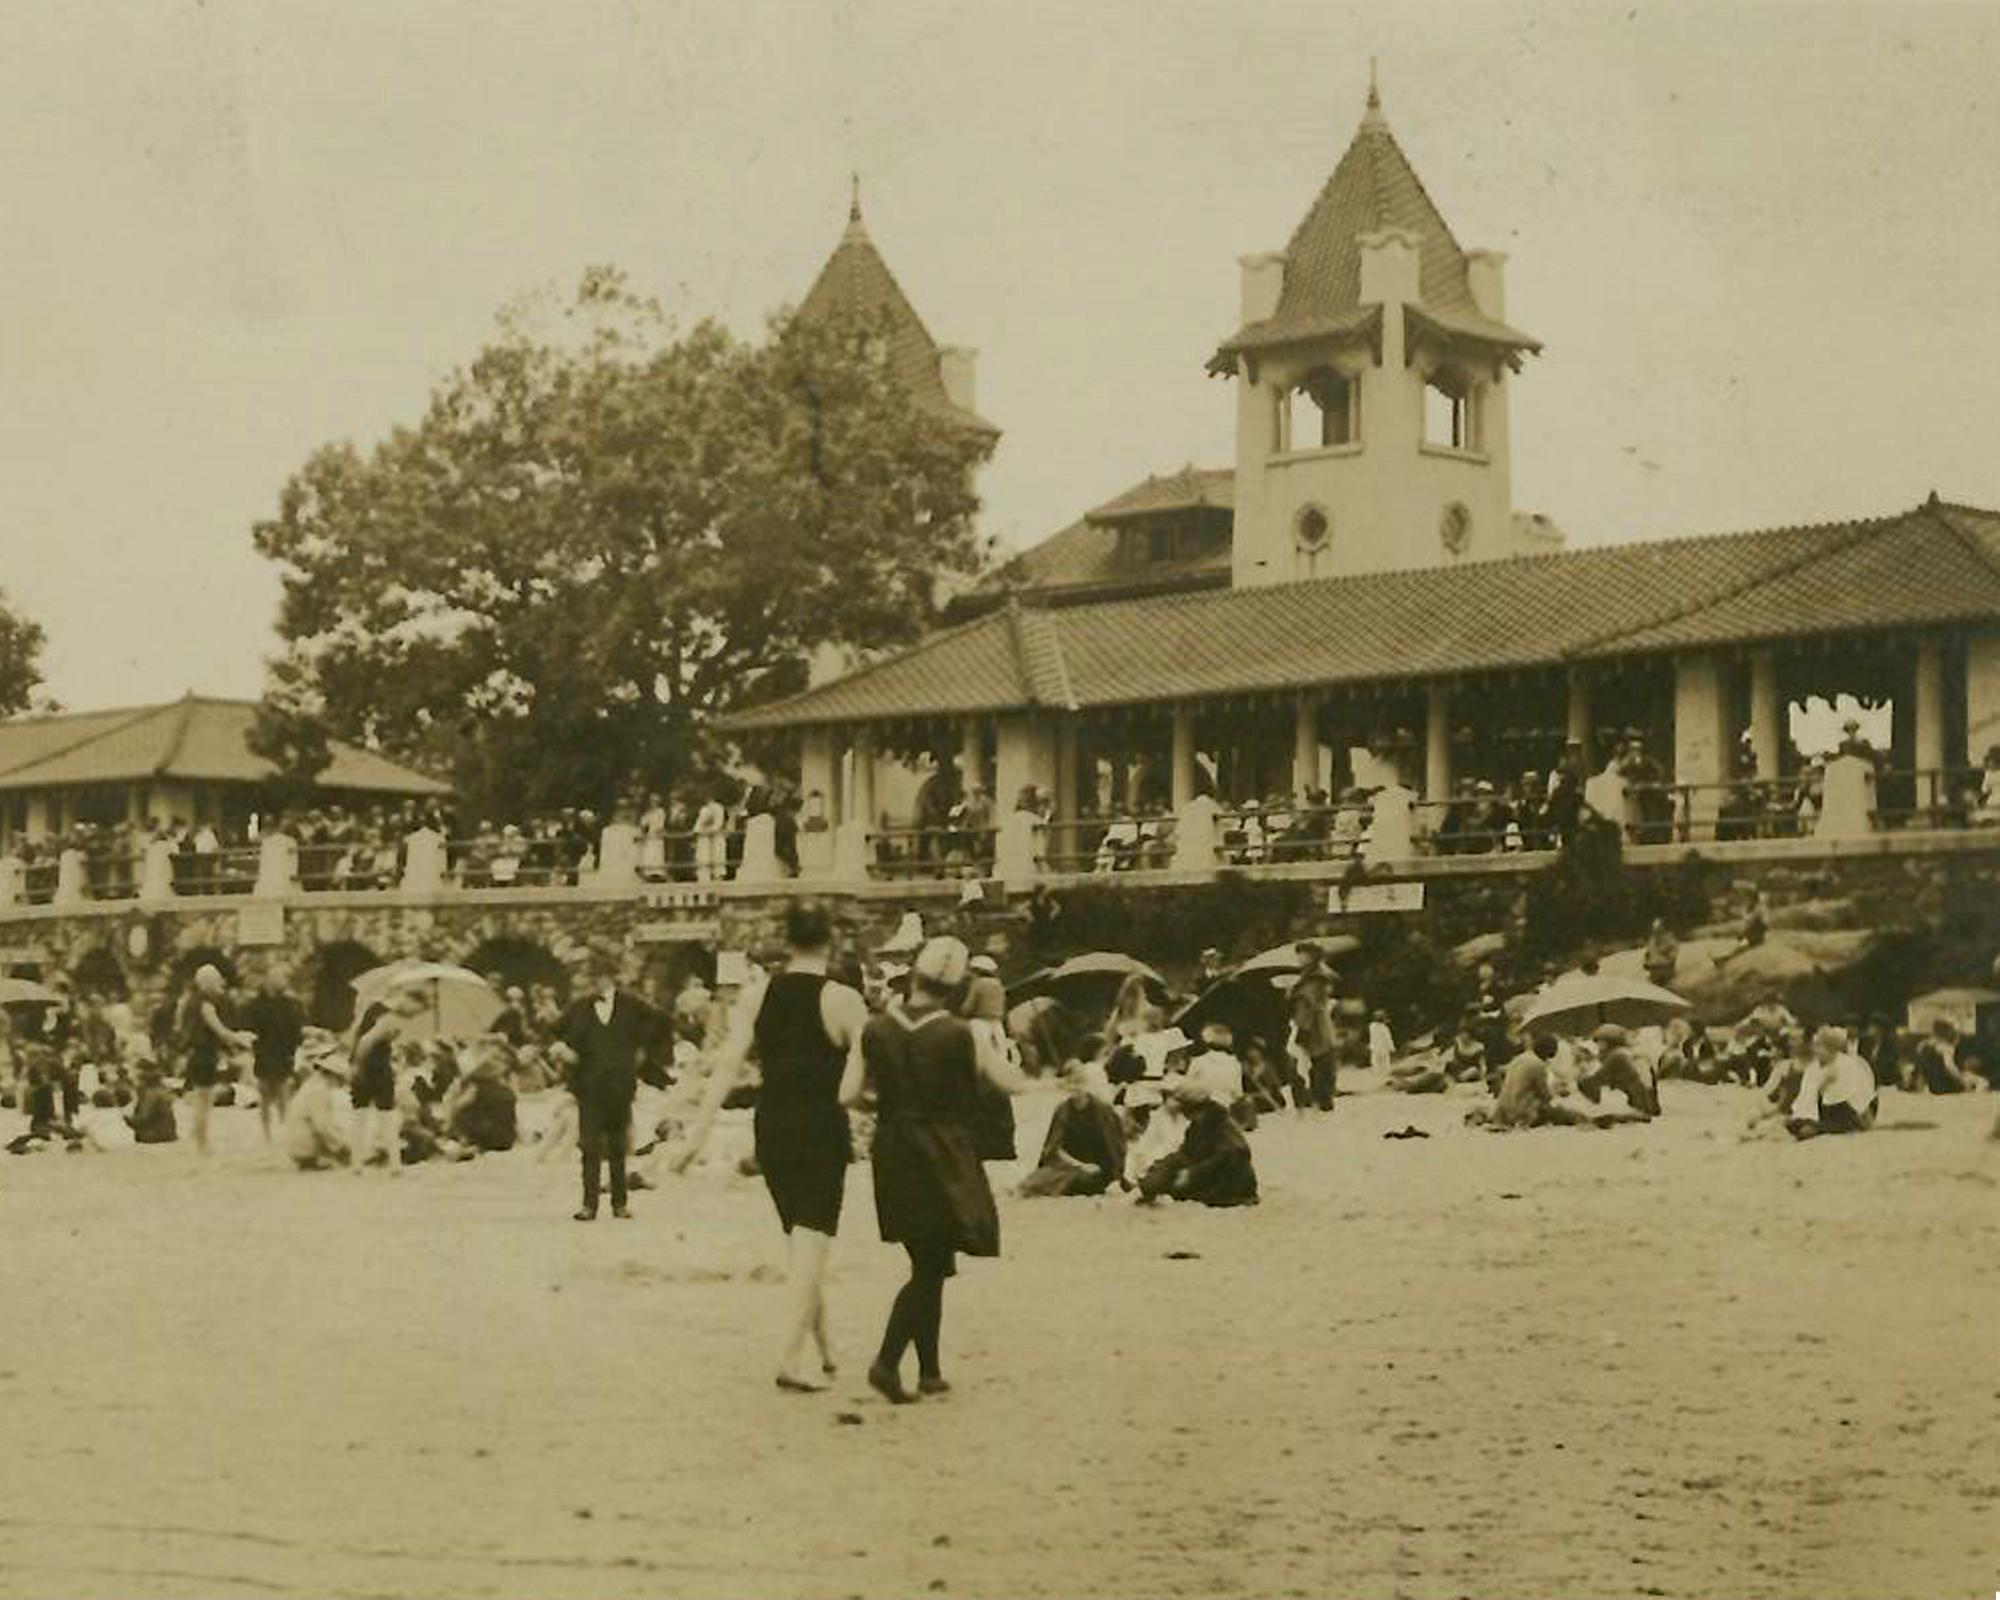 Rye Town Park Bathhouse and Pavilions c 1920